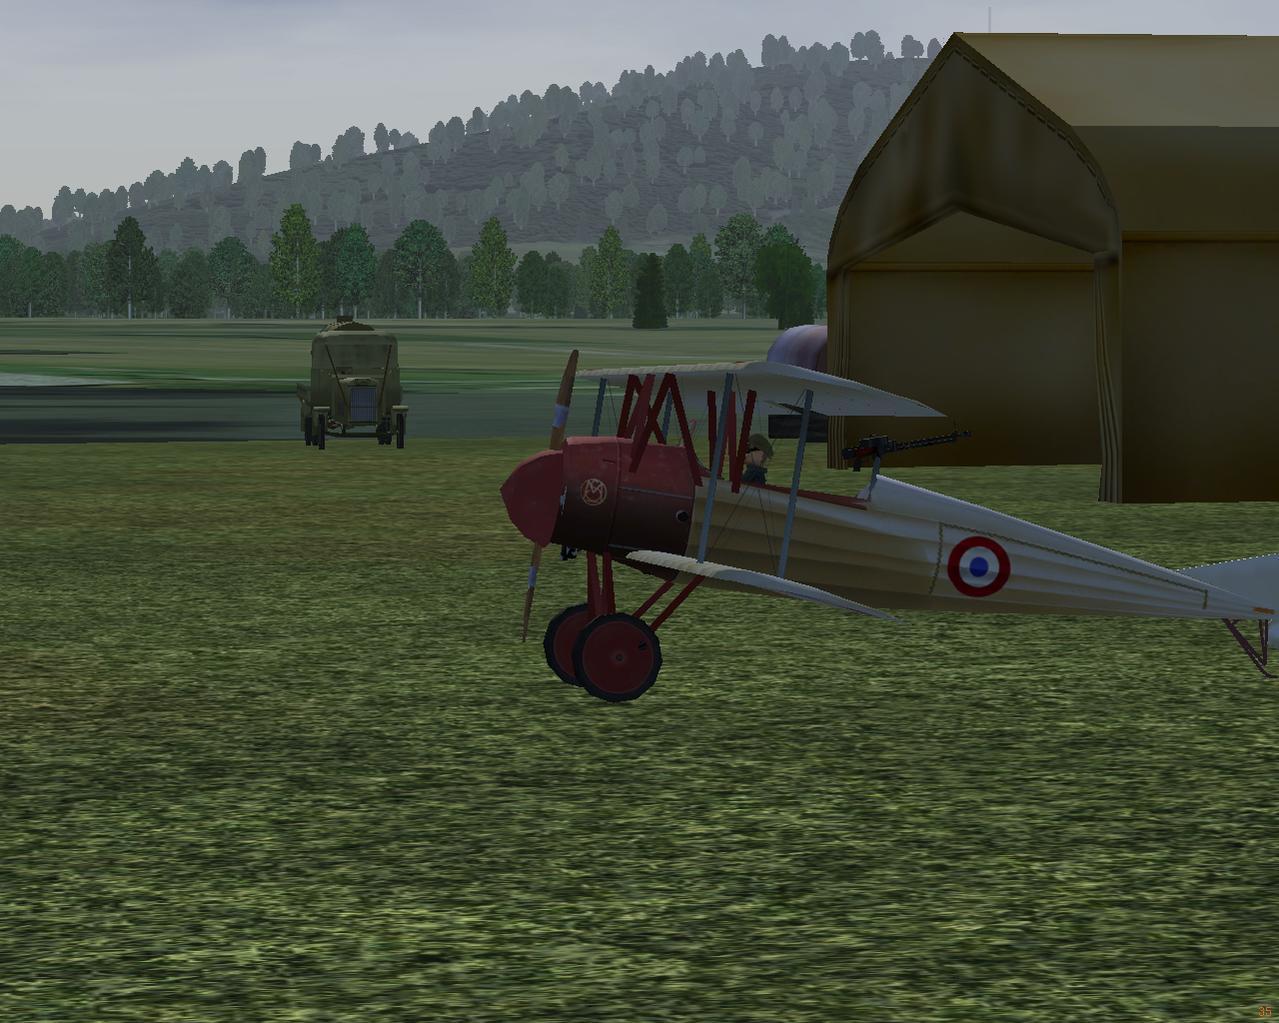 Morane BB at Belfort with Bessenau double hangars